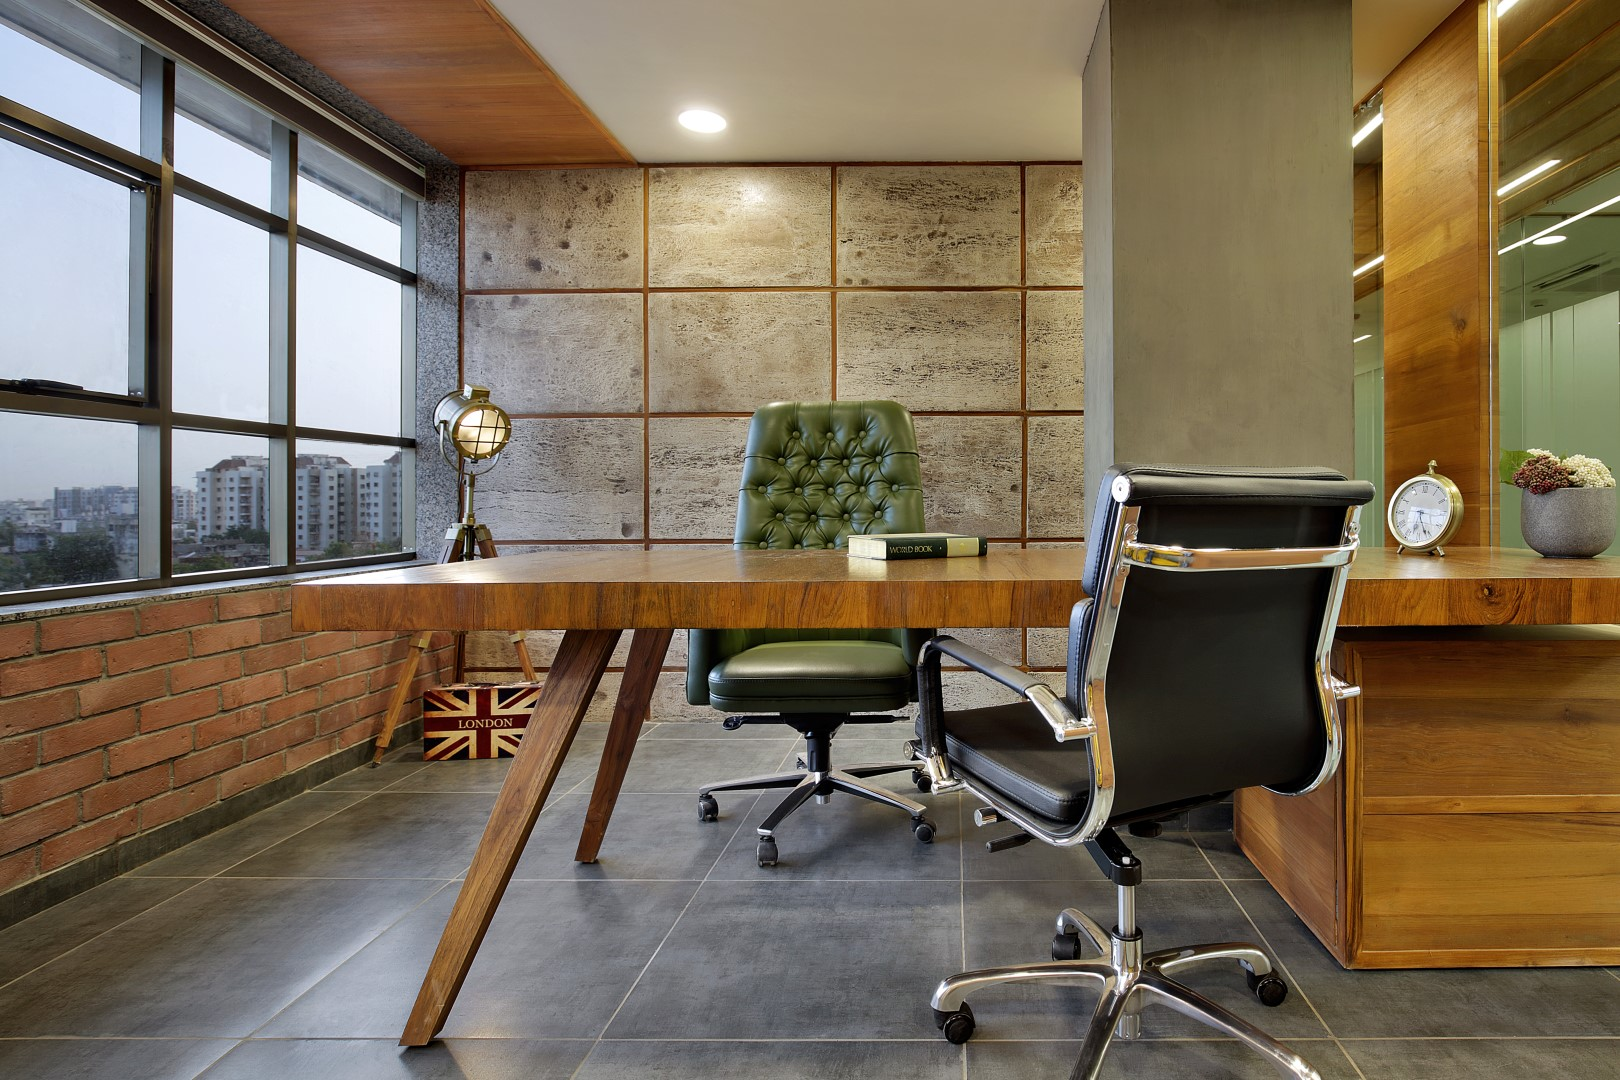 Front Room Interior Design